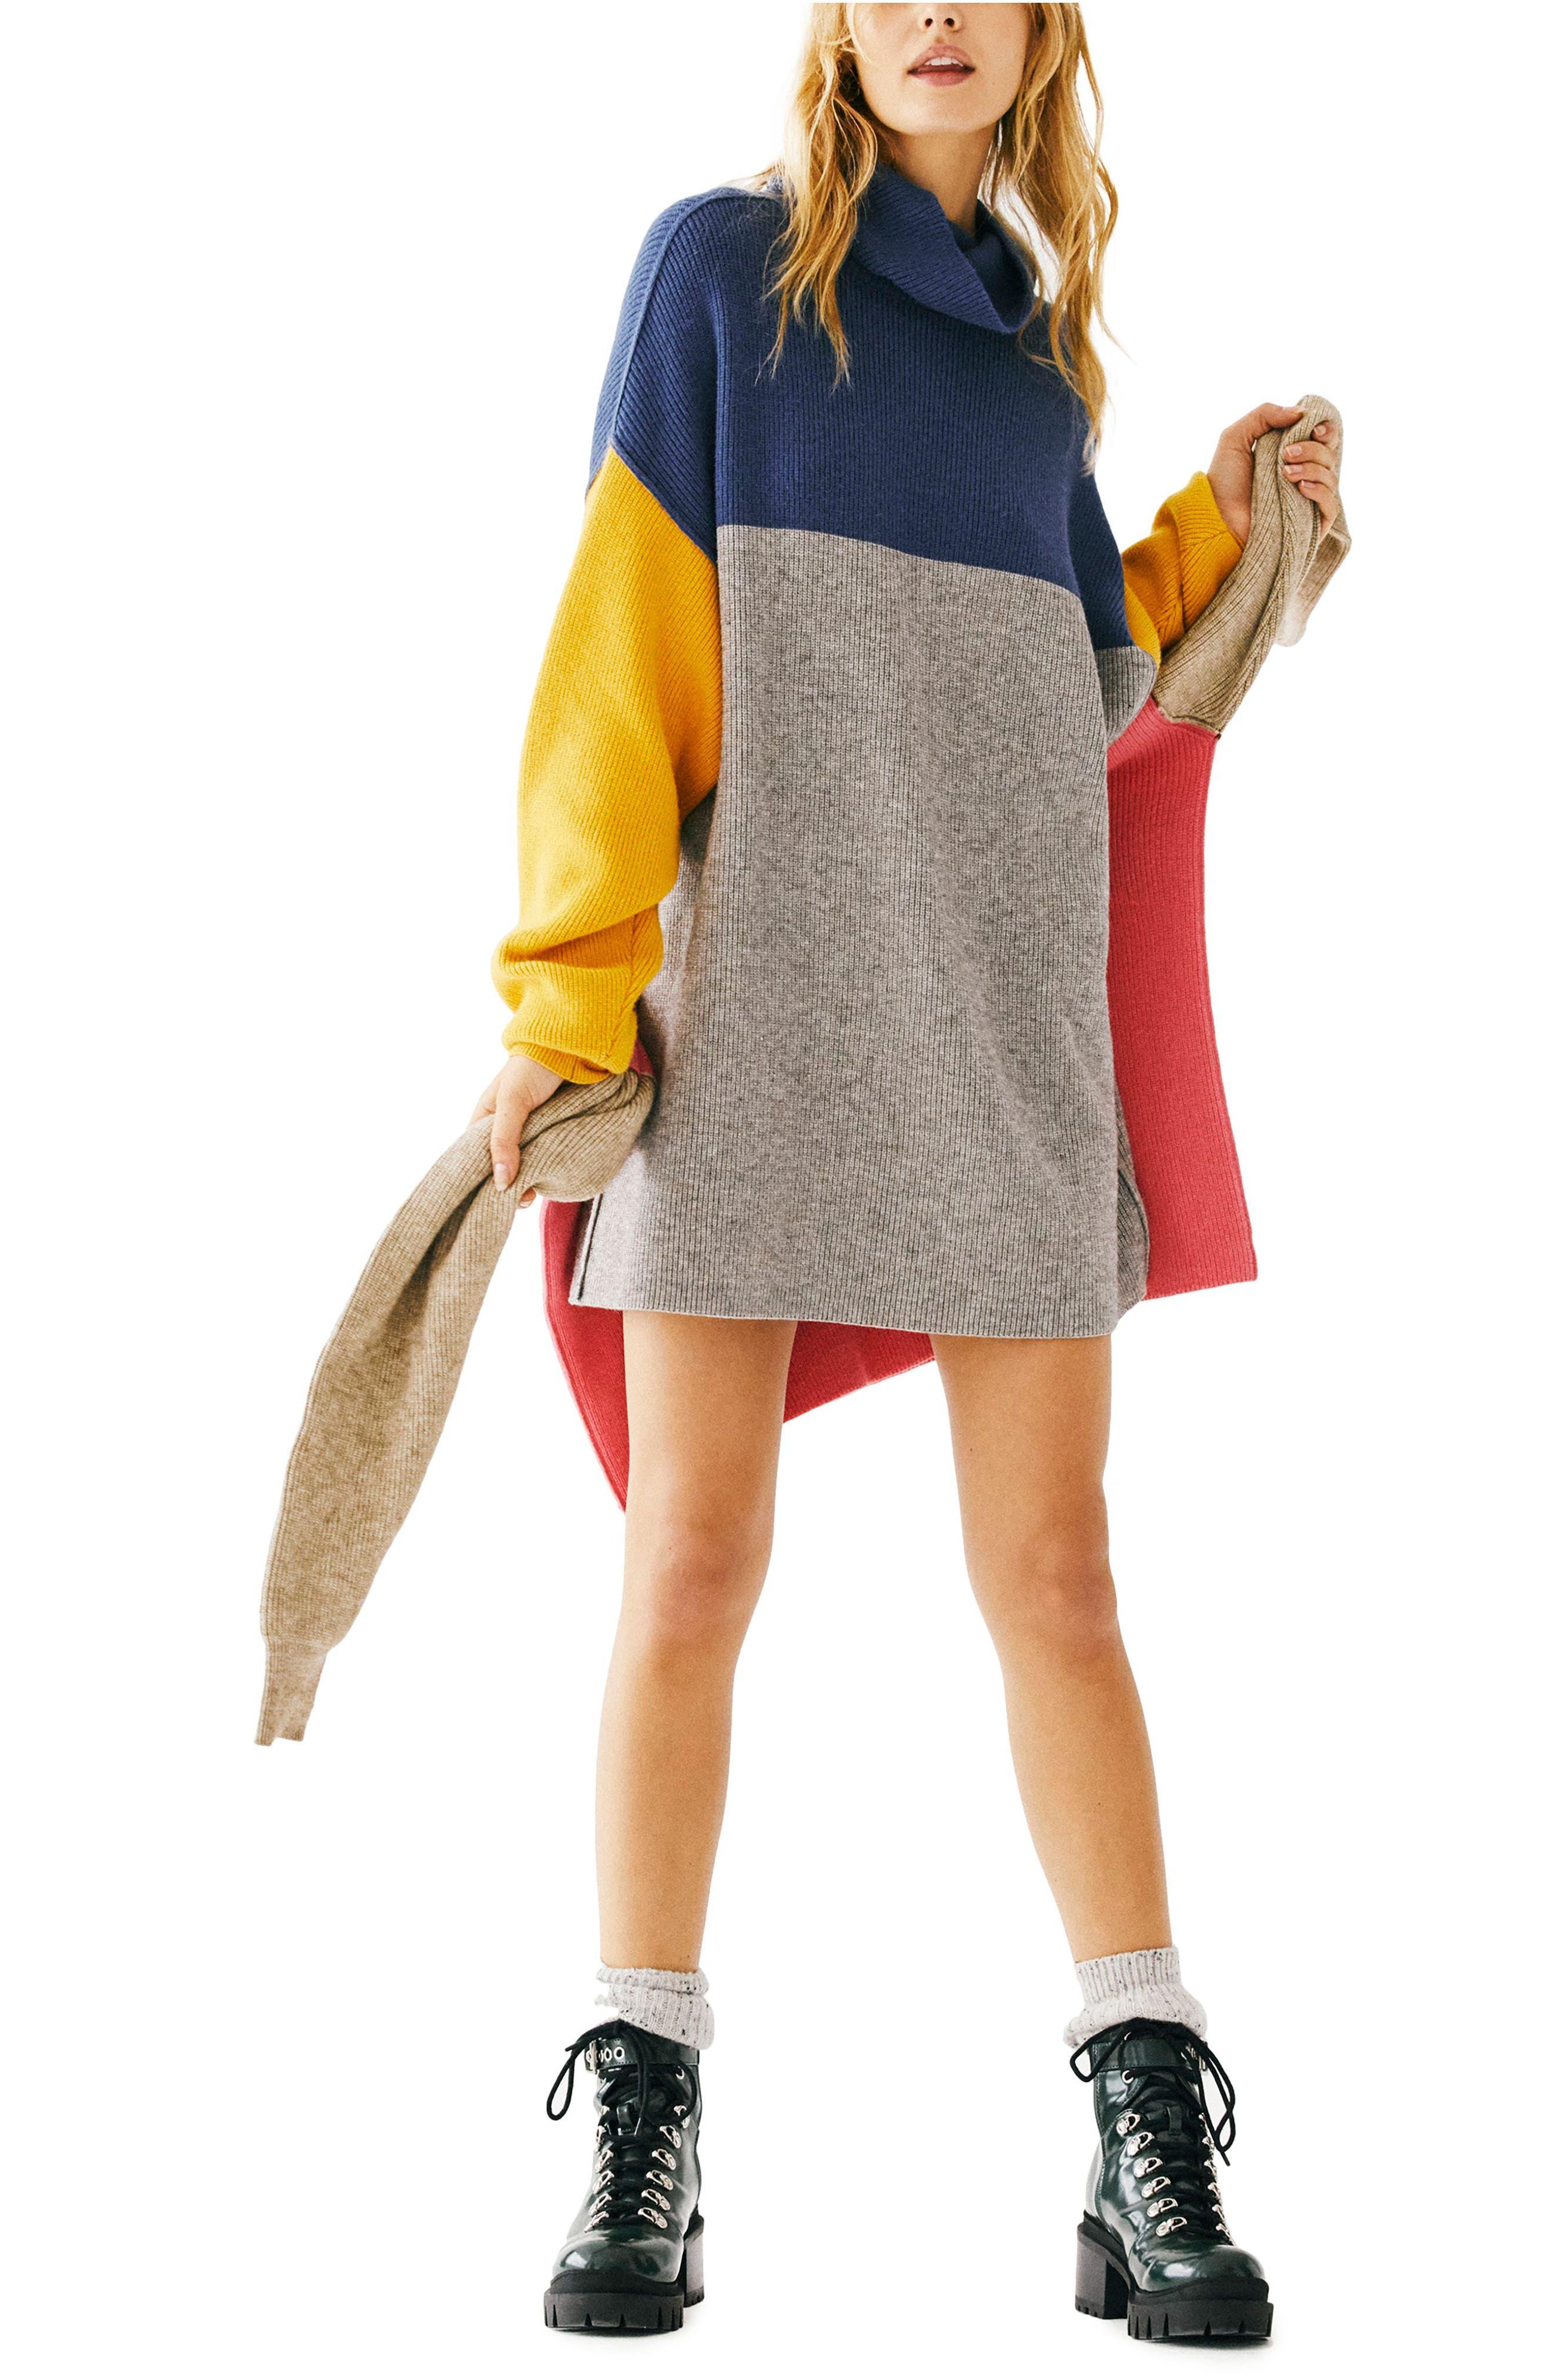 FREE PEOPLE, Colorblock Turtleneck Sweater, Alternate thumbnail 5, color, 400